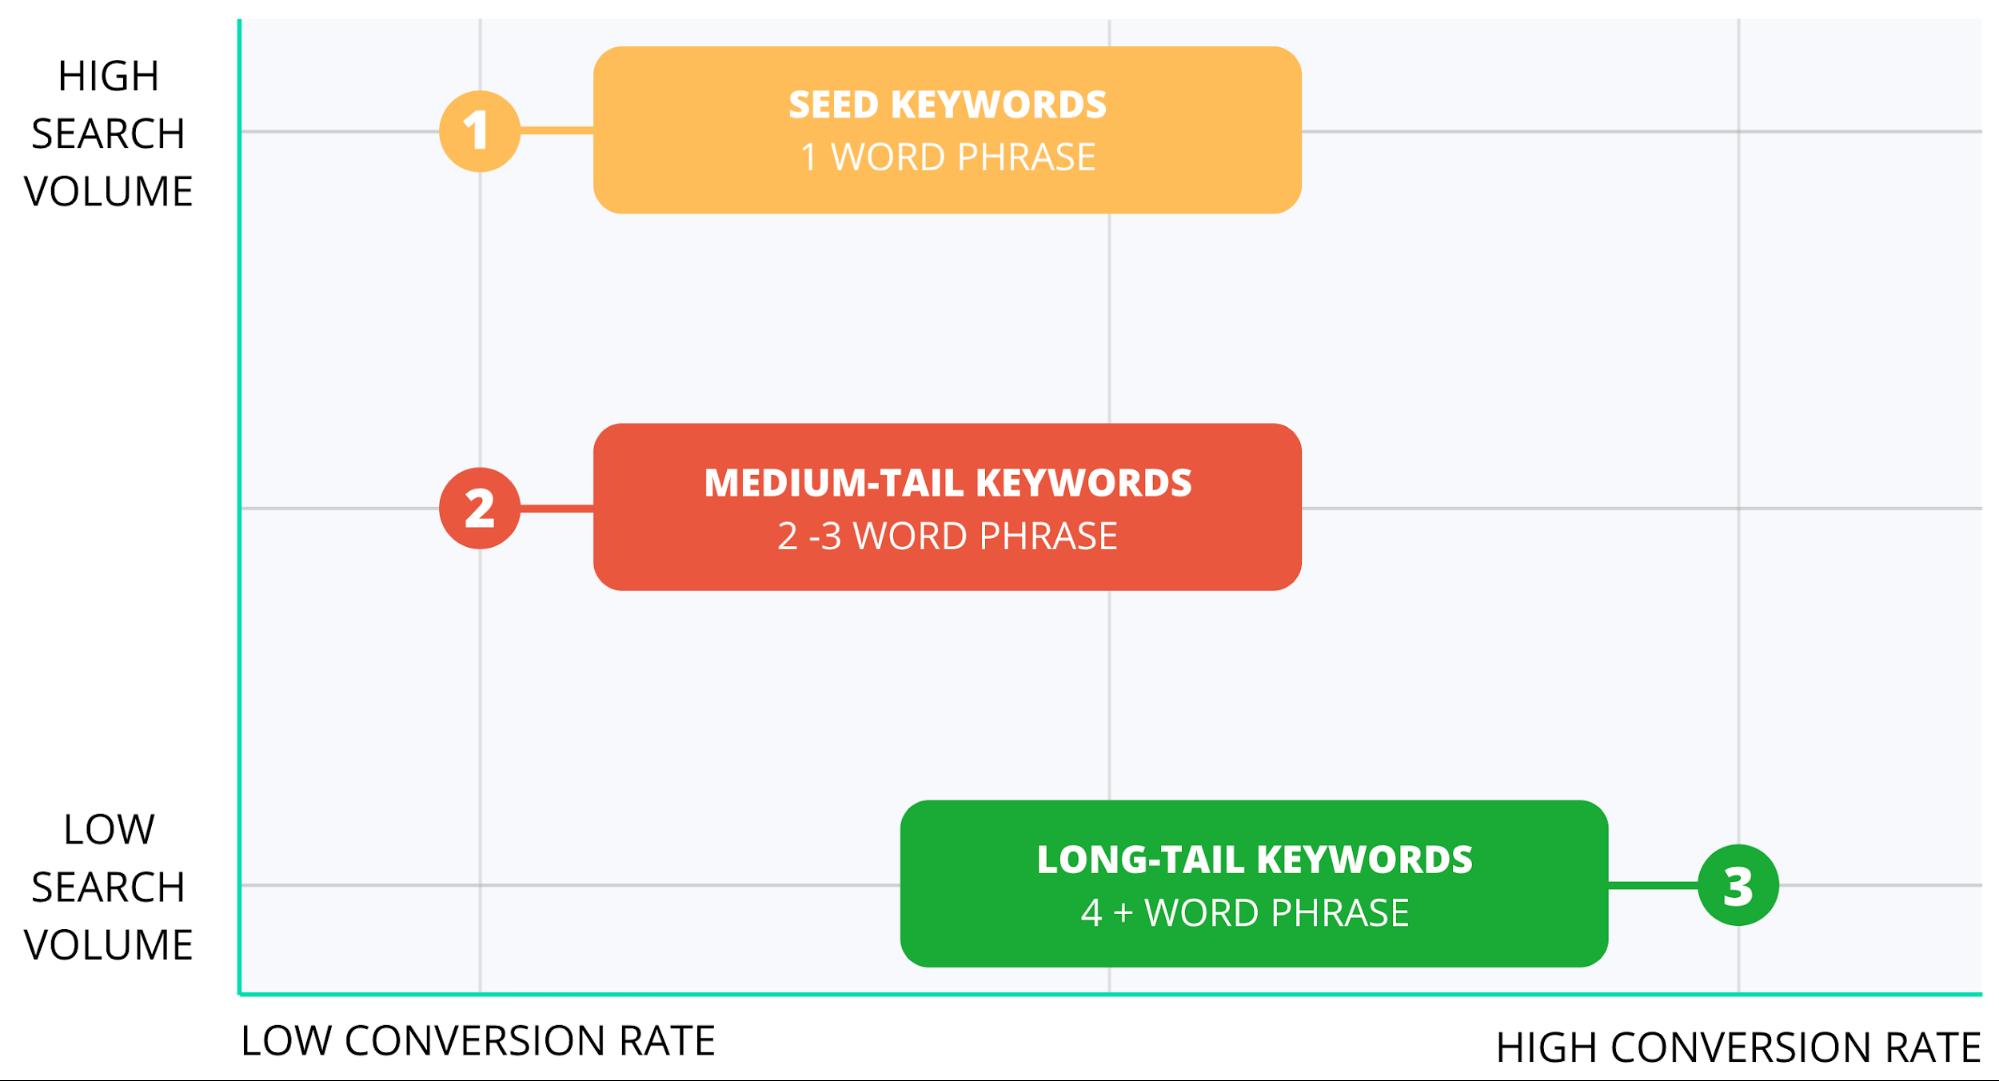 search volume versus conversion rate graph